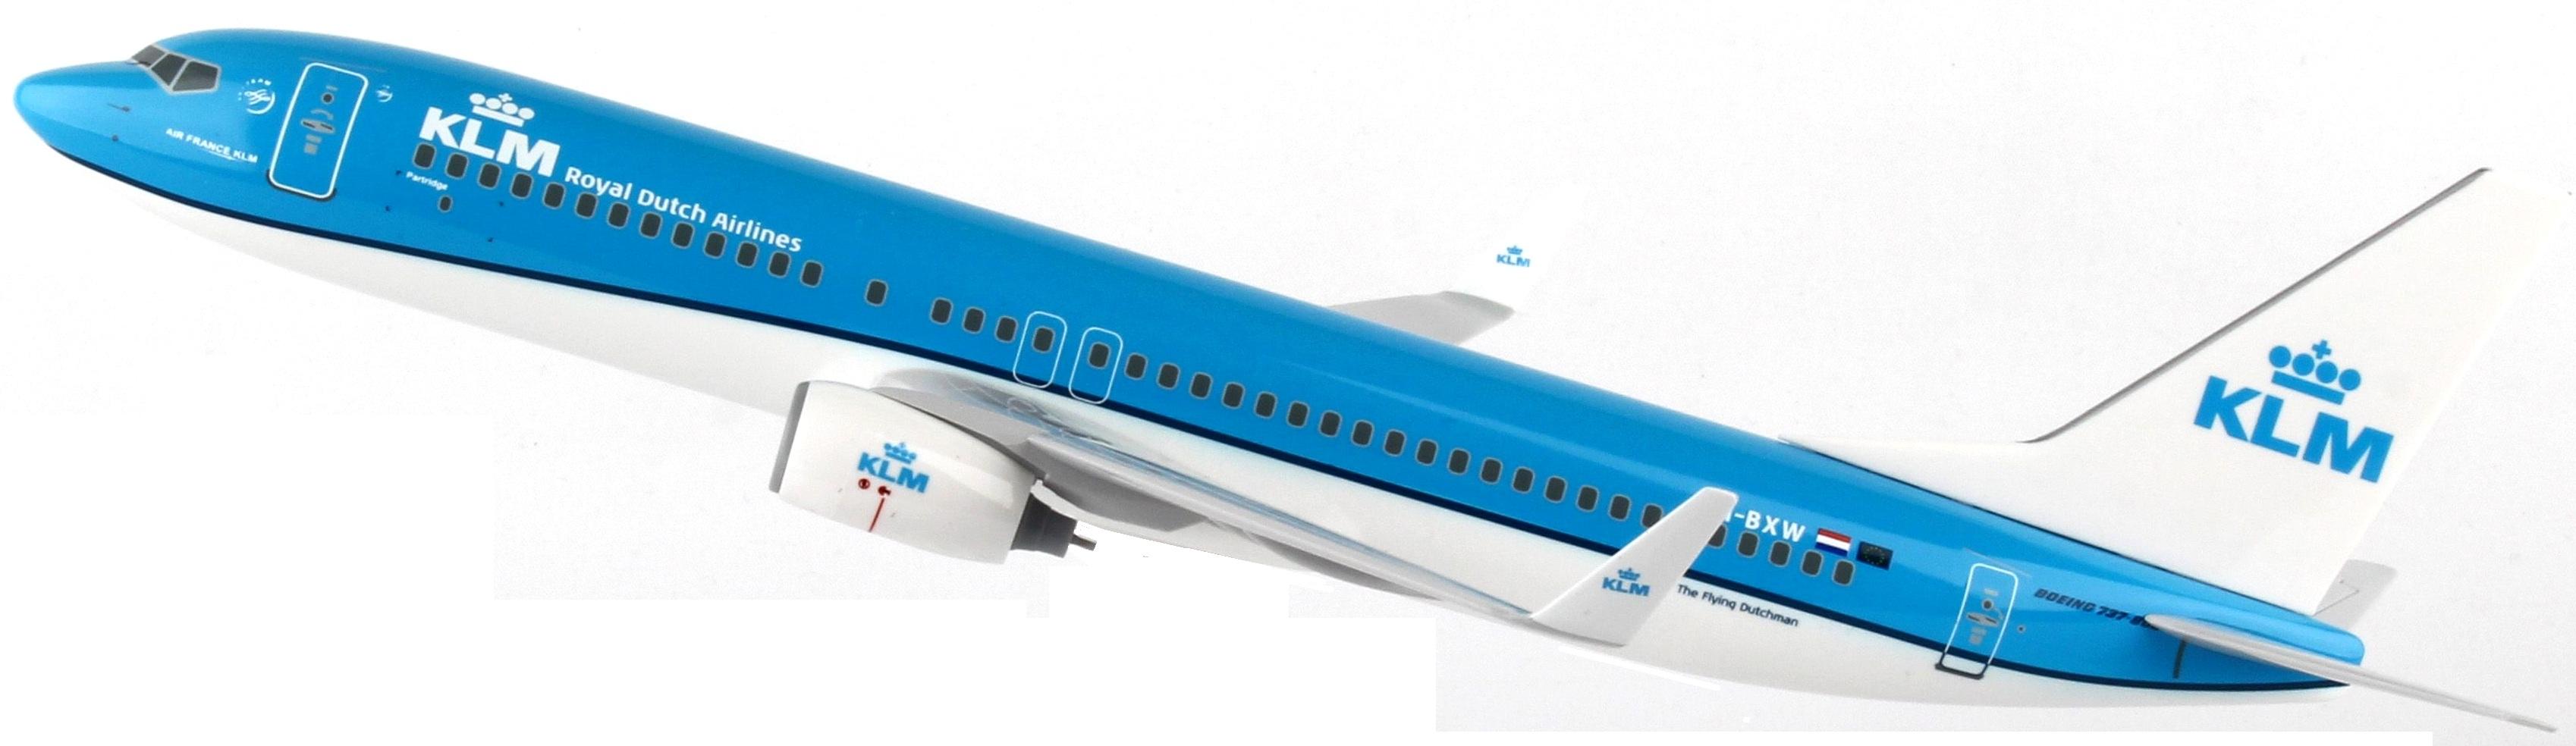 KLM_73780002